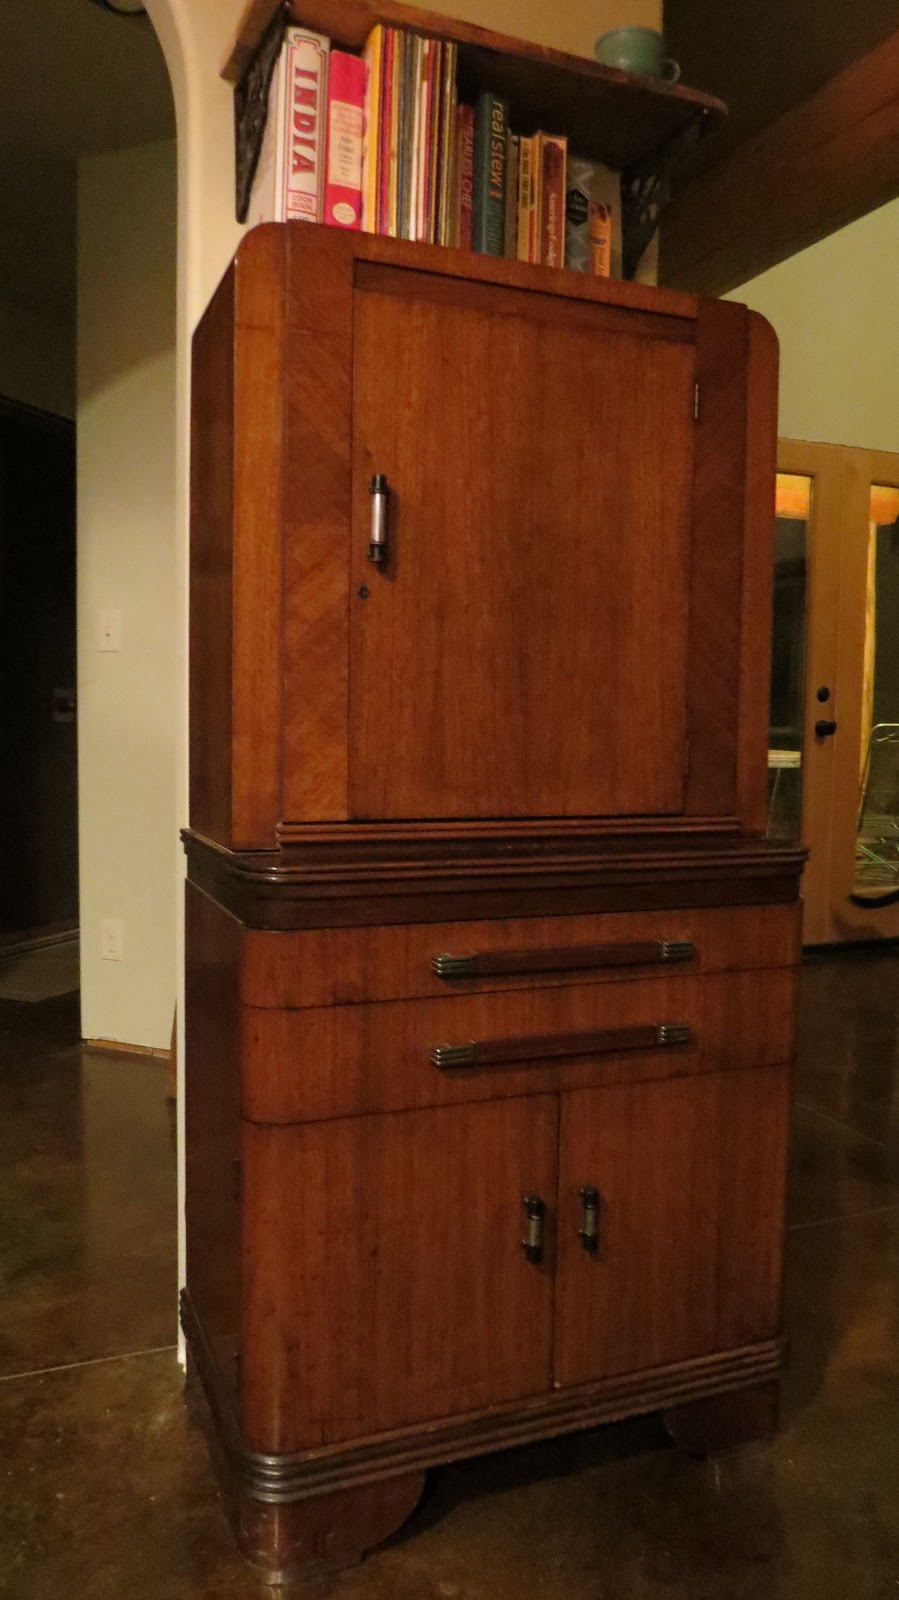 Craigslist Orange County Cars For Sale By Owner >> Craigslist Los Angeles Furniture   Bed Mattress Sale